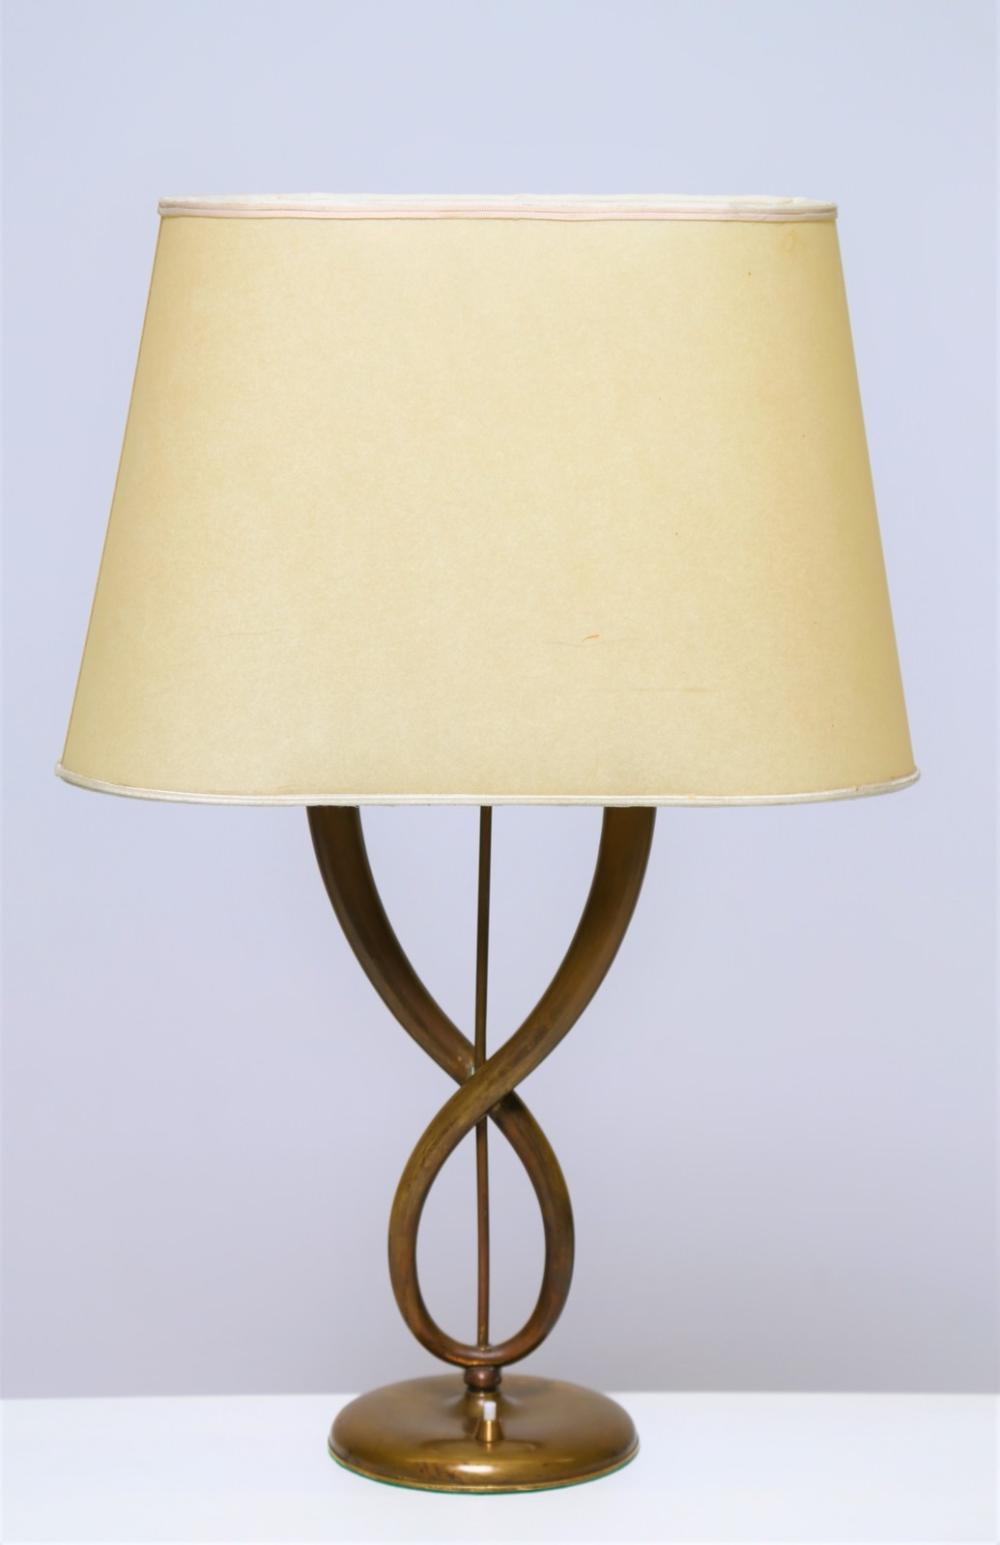 PONTI GIO' (1891 - 1979) Table lamp